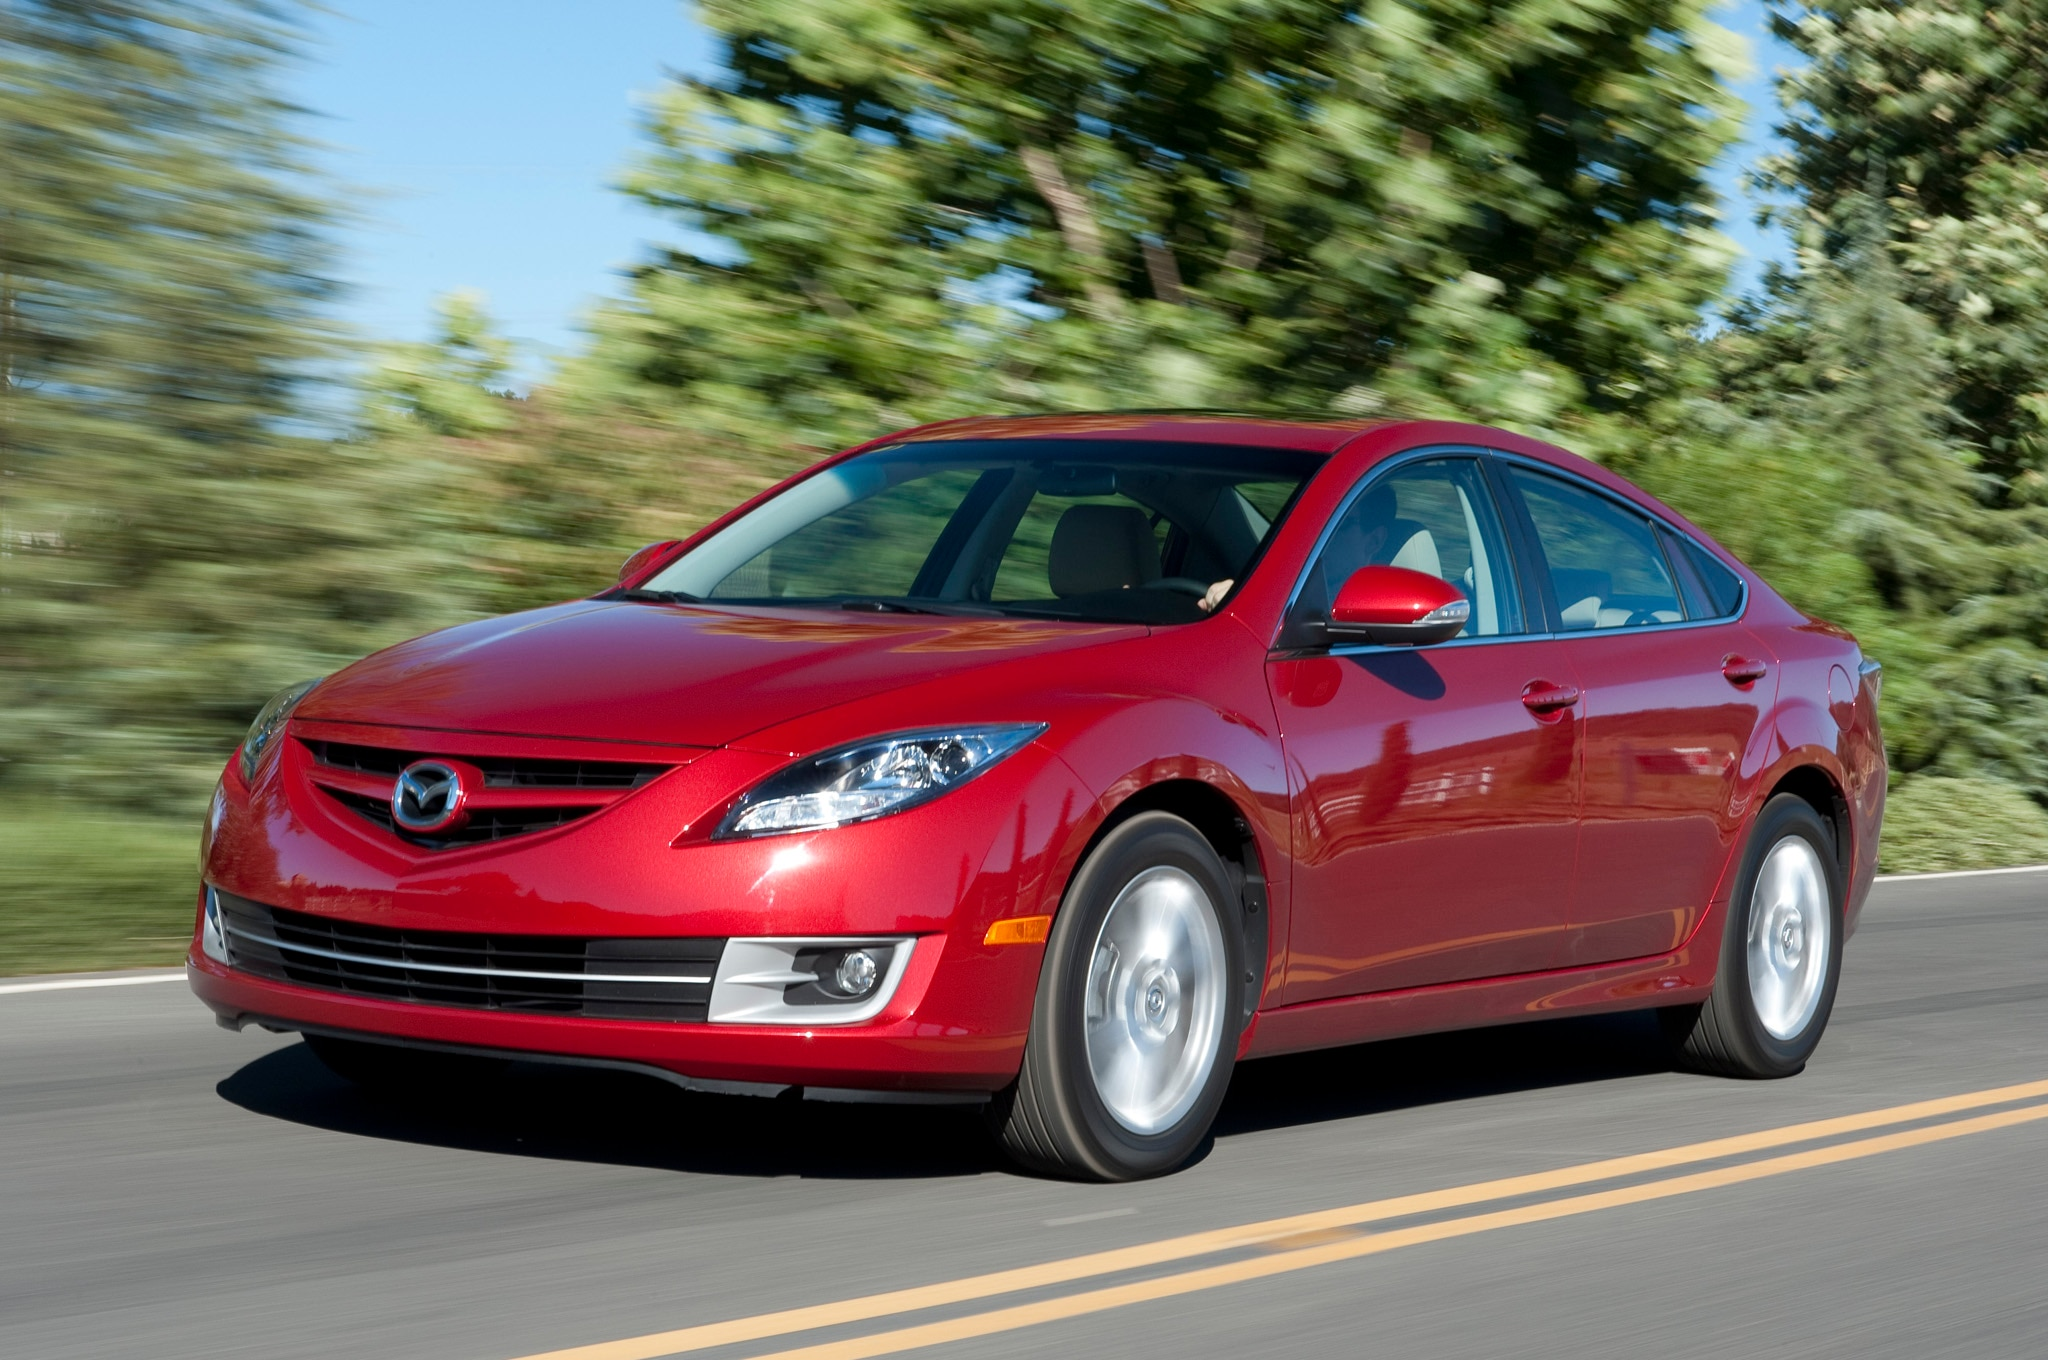 2012 Mazda 6 Front Three Quarters1